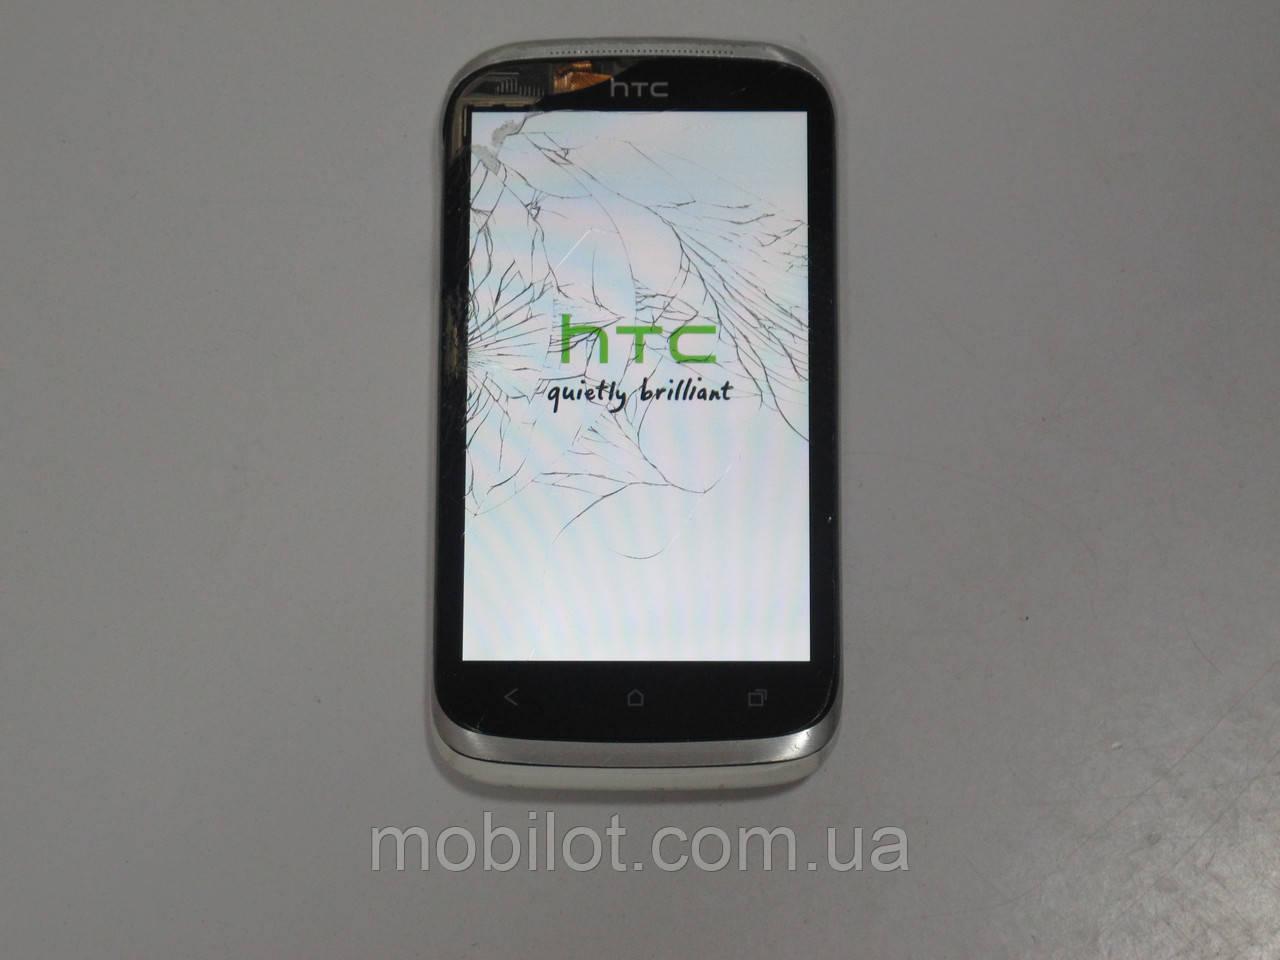 b18f4fe1d42bd Мобильный телефон HTC Desire X T328e (TZ-3076) - интернет-магазин Mobilot